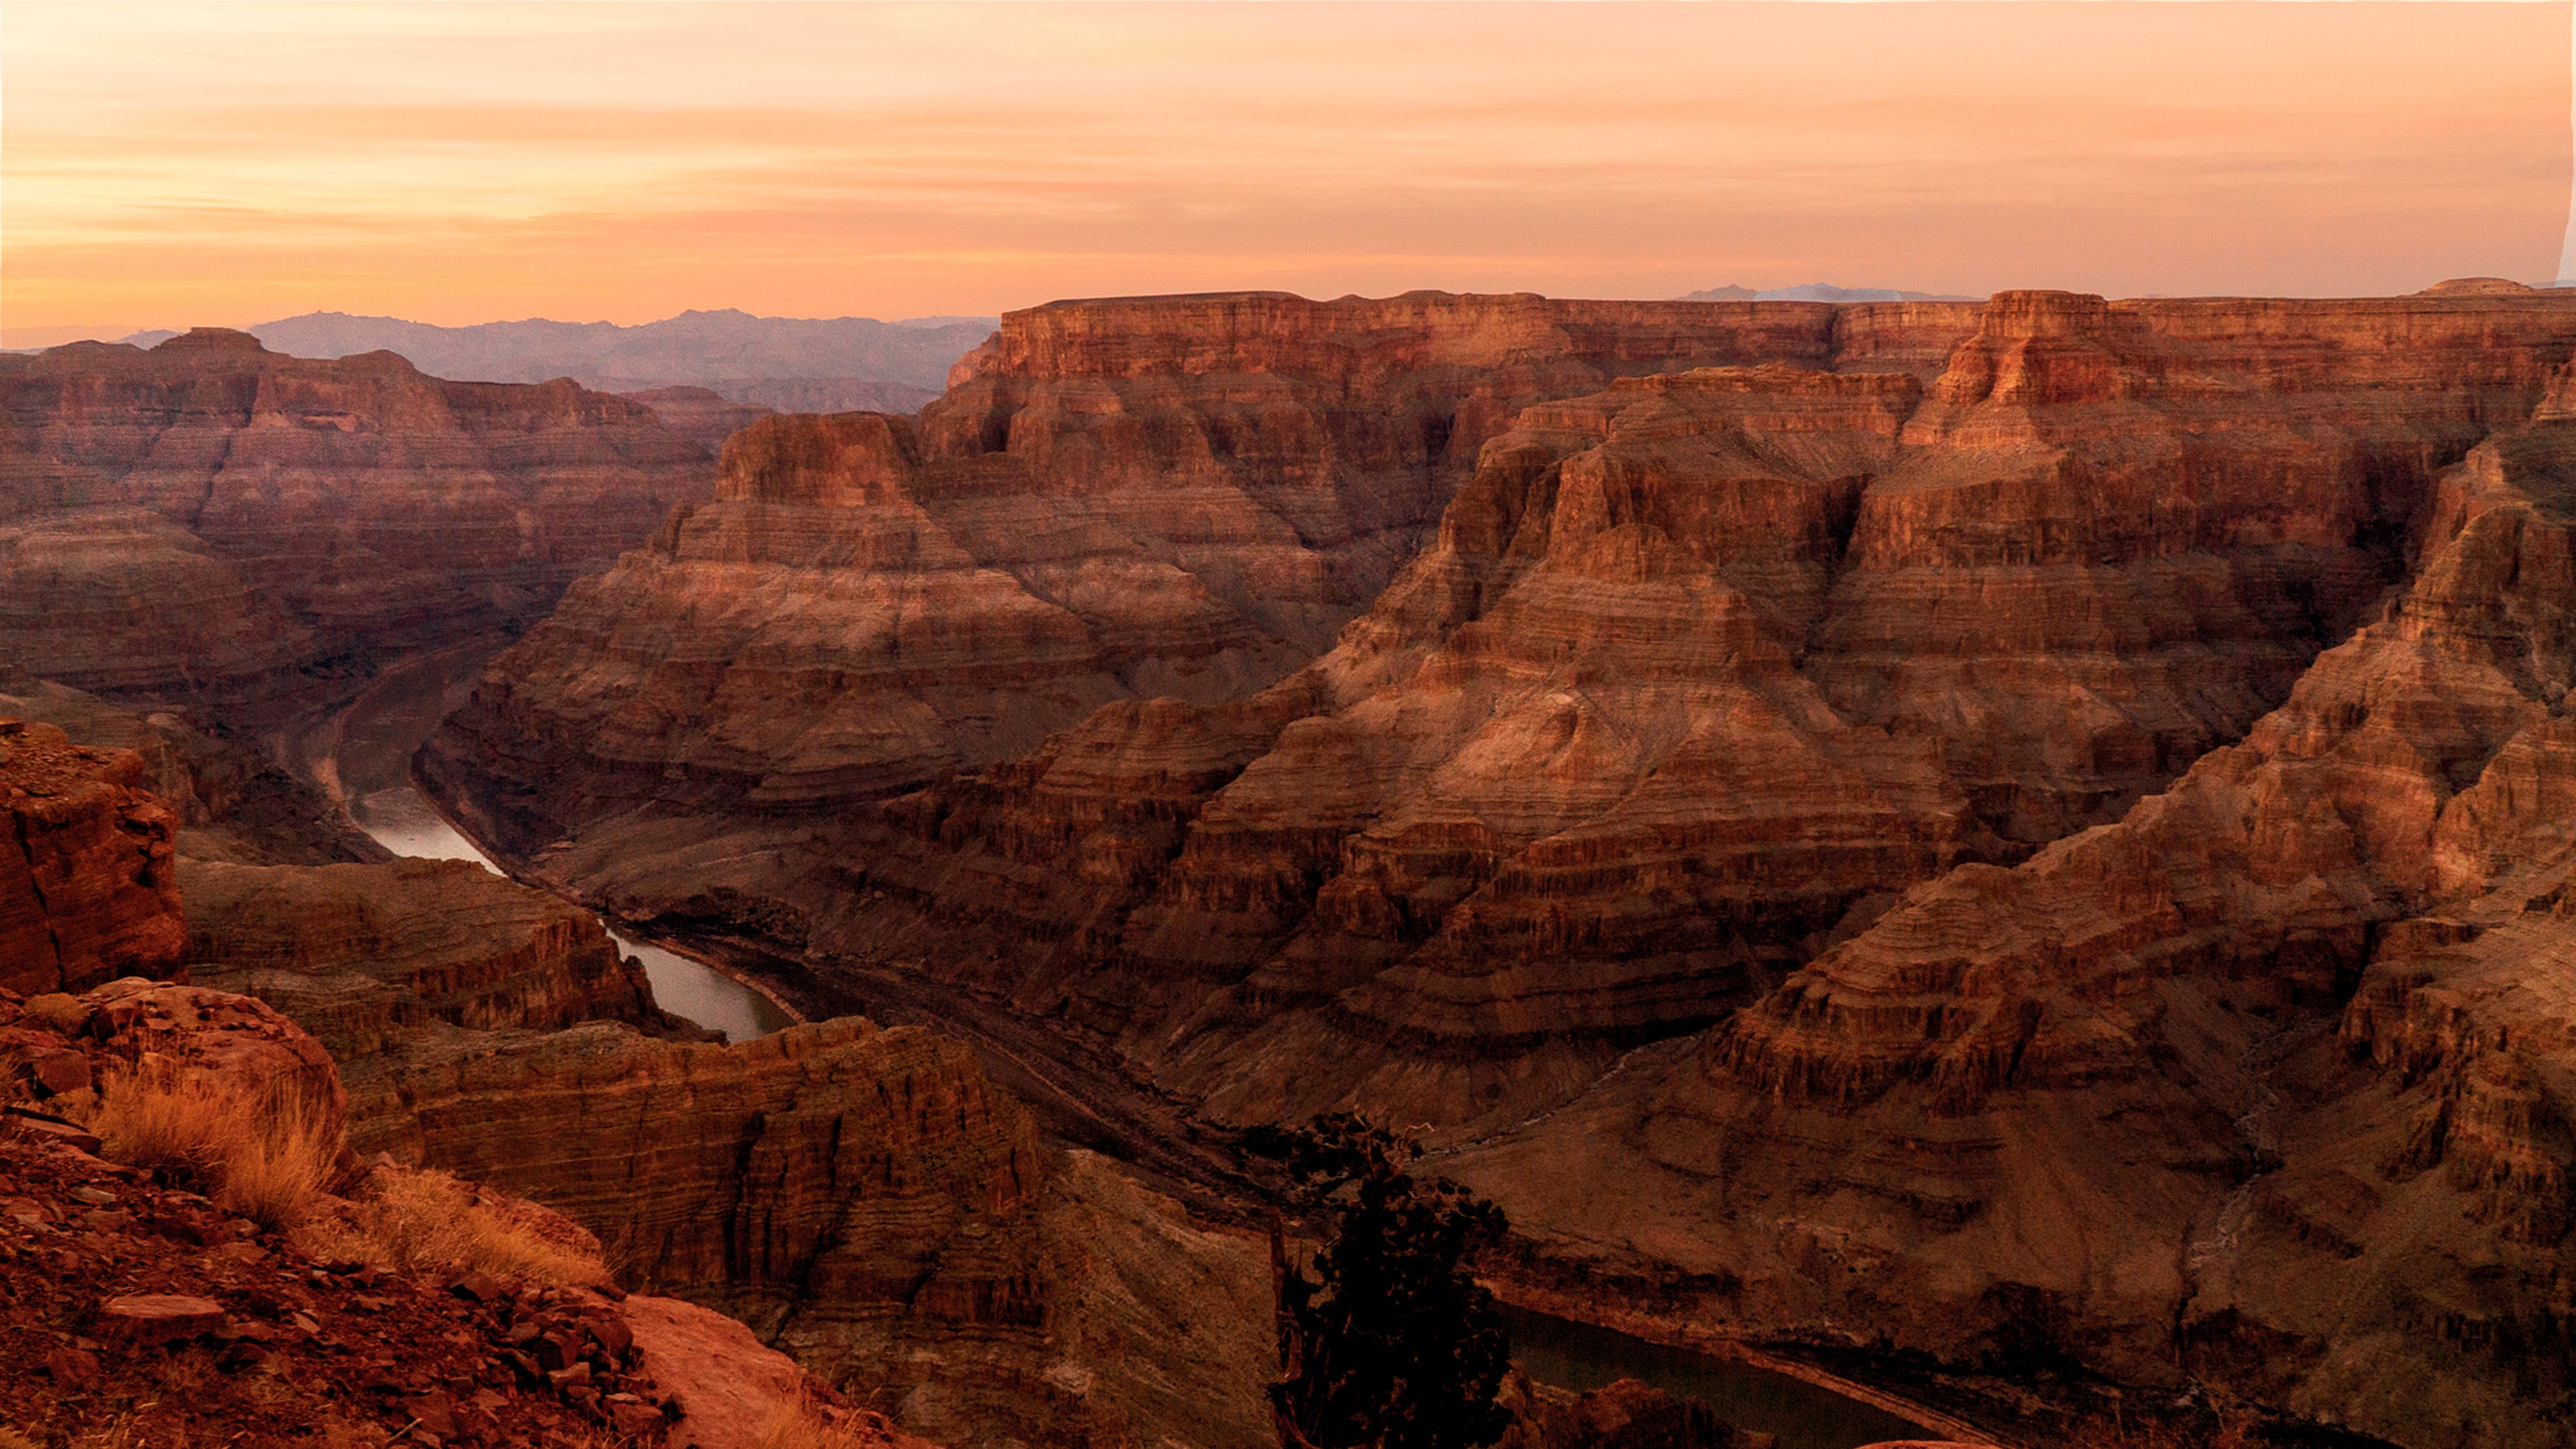 Kostenloses Stock Foto zu bildschirm, canyon, goldene sonne, grand canyon